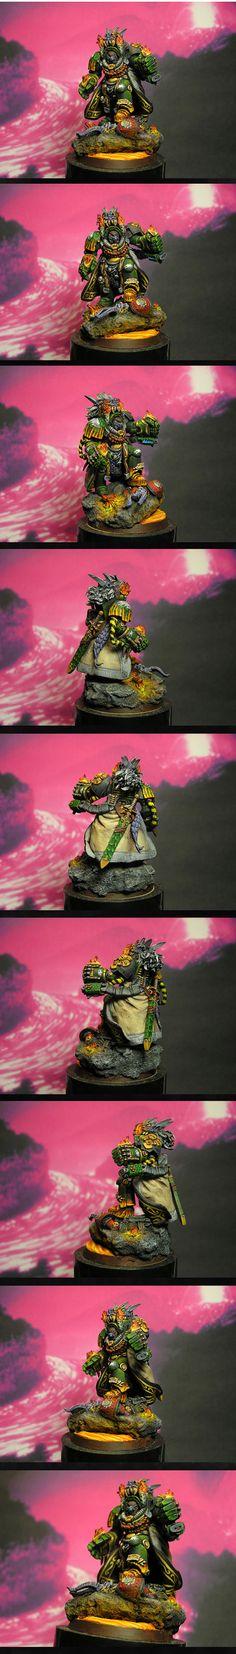 Tu'shan, Chapter master of Salamanders (NMM)